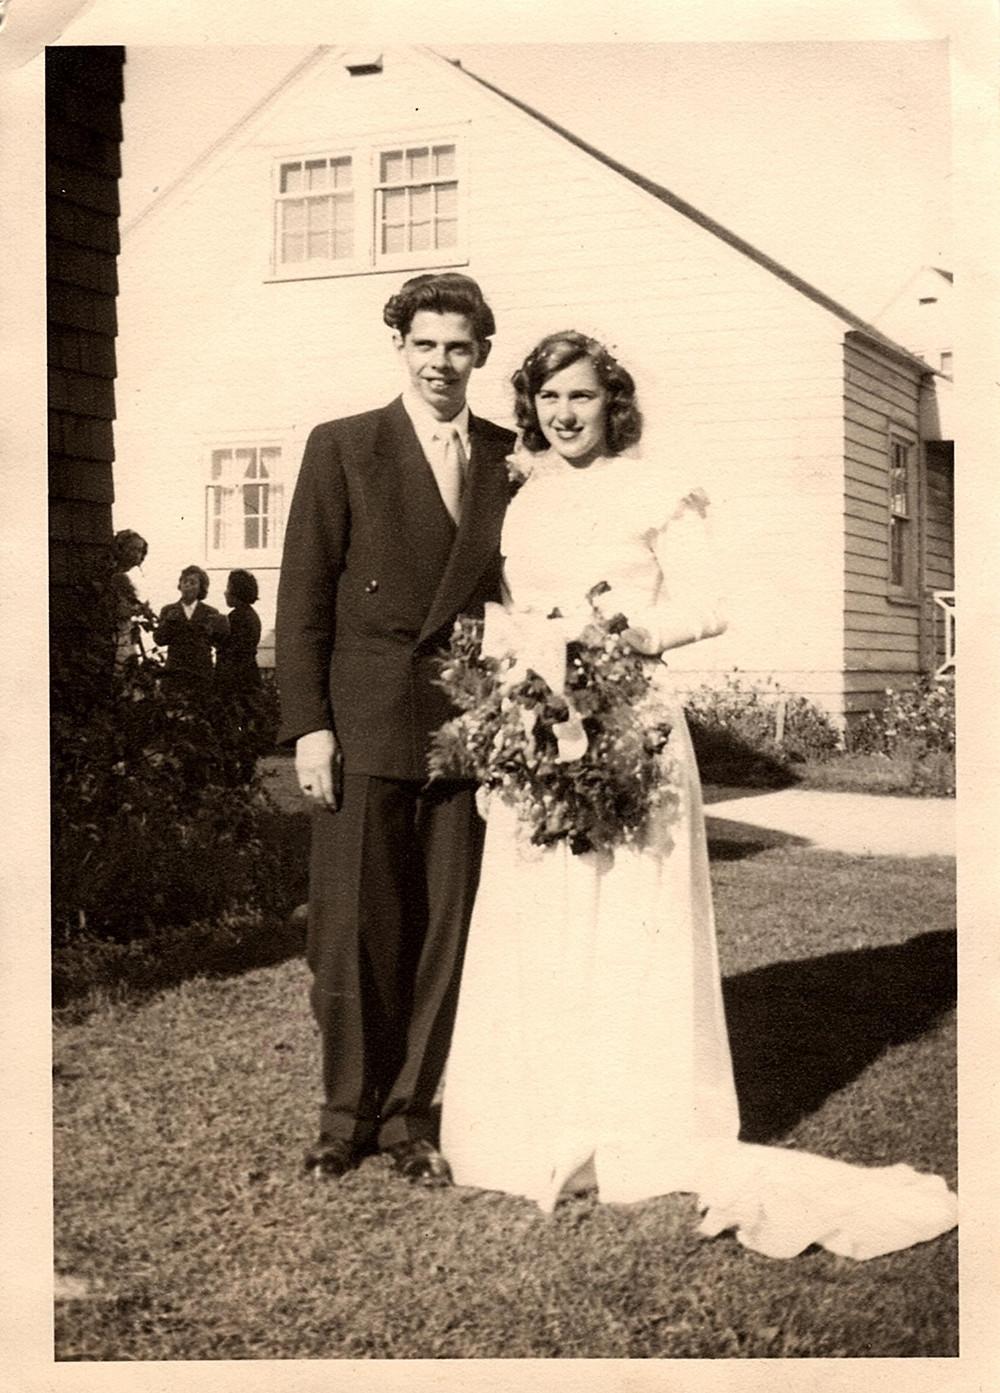 antique wedding photograph, outside